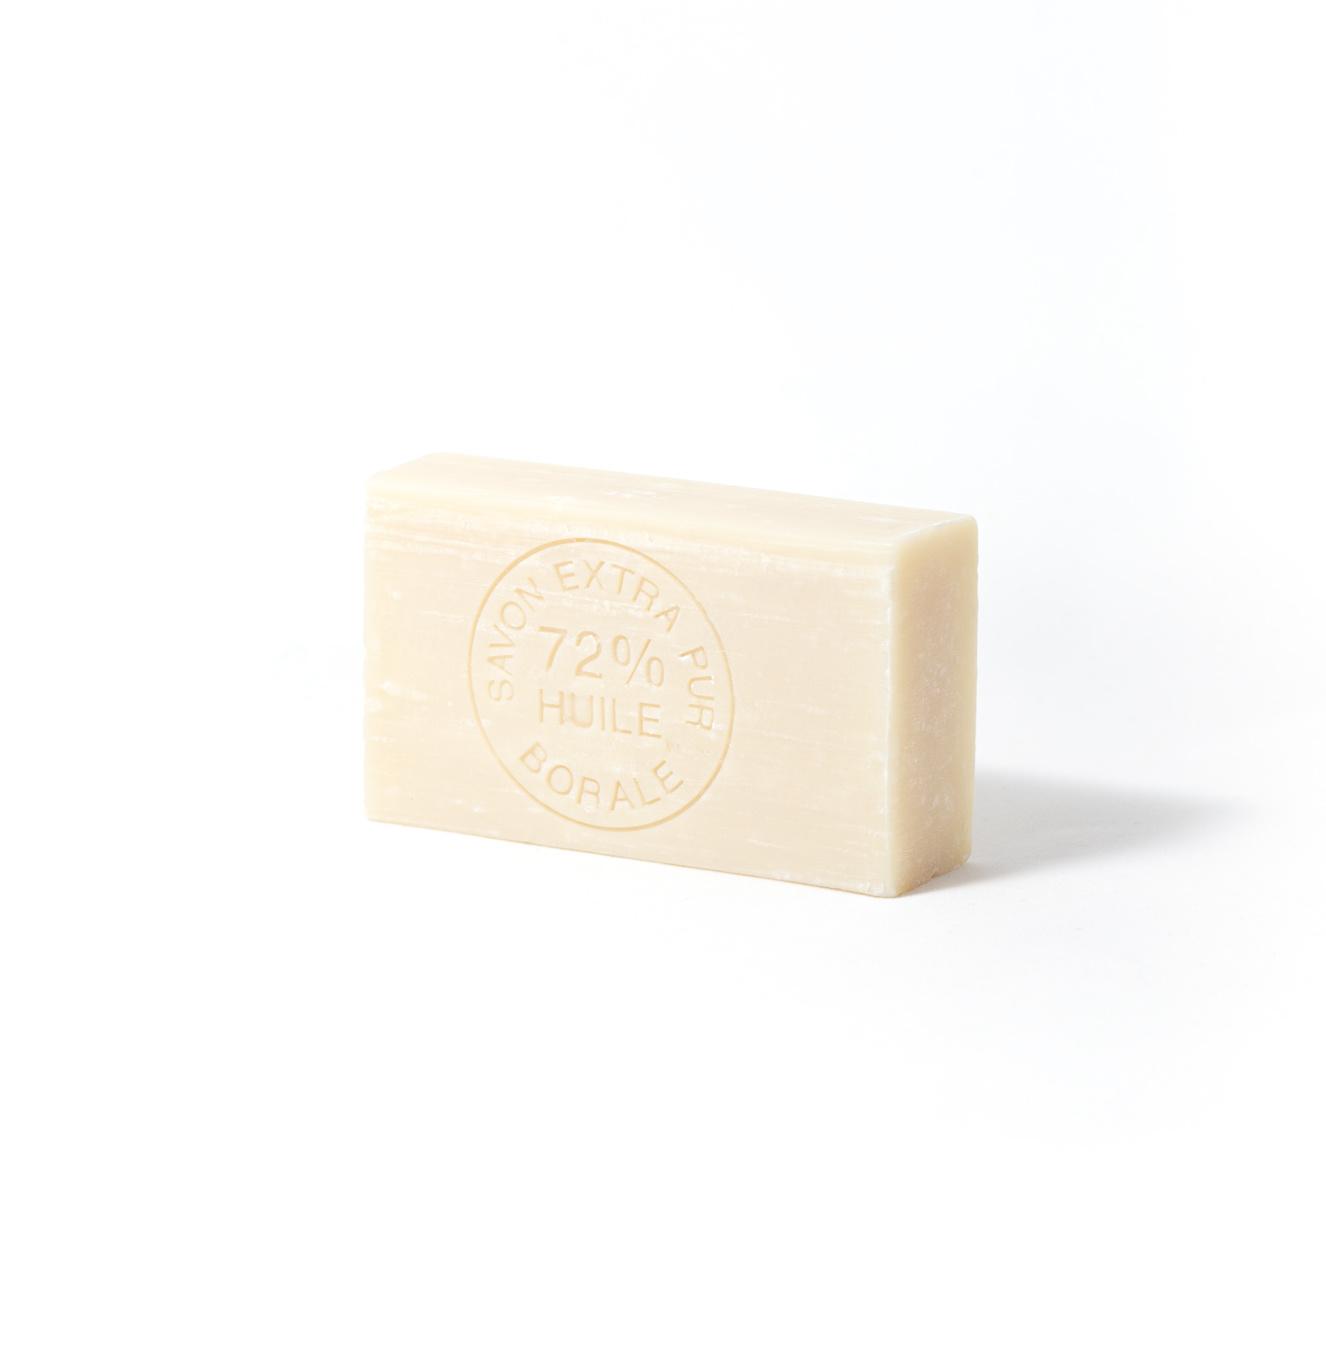 EXTRA PUR SOAP BAR #07 BORALE 155 G